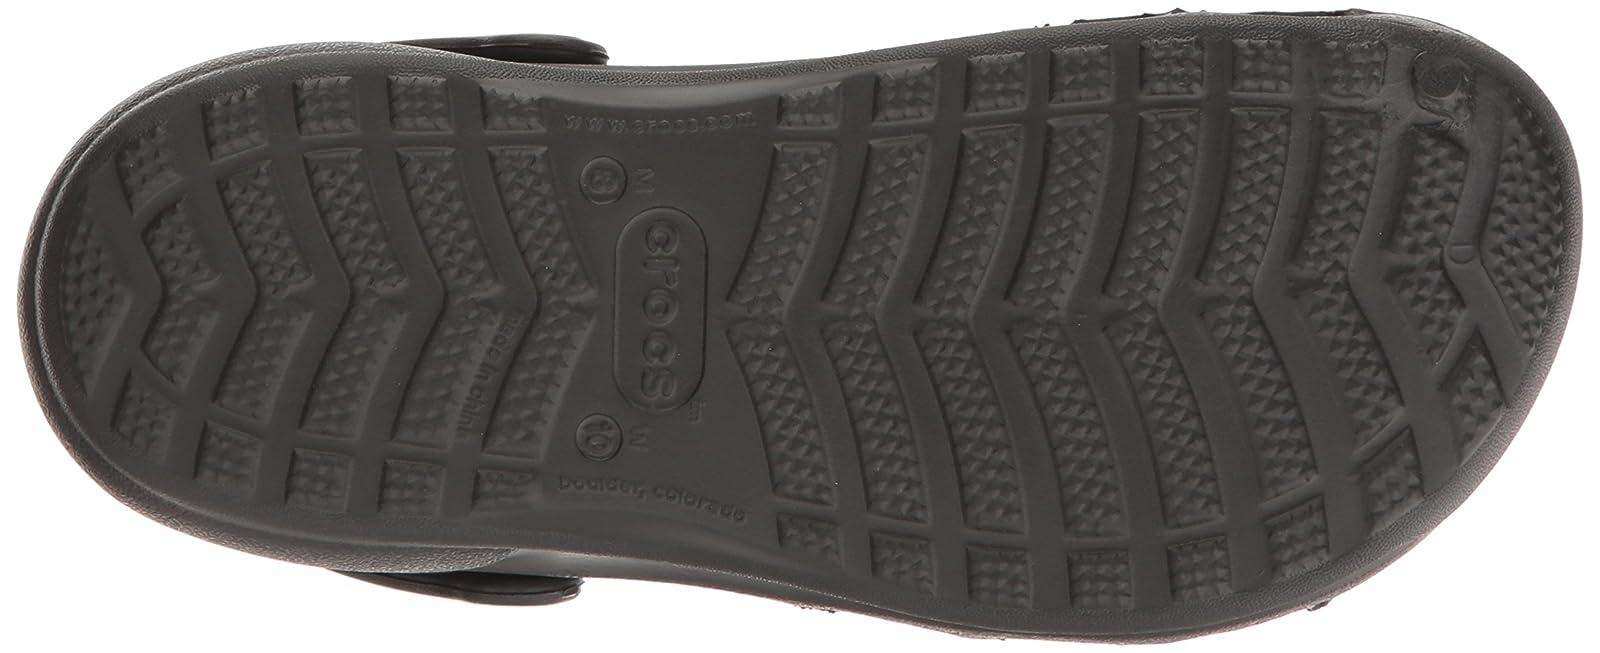 Crocs Unisex Specialist Vent Clog Black 11 10074M Black - 3